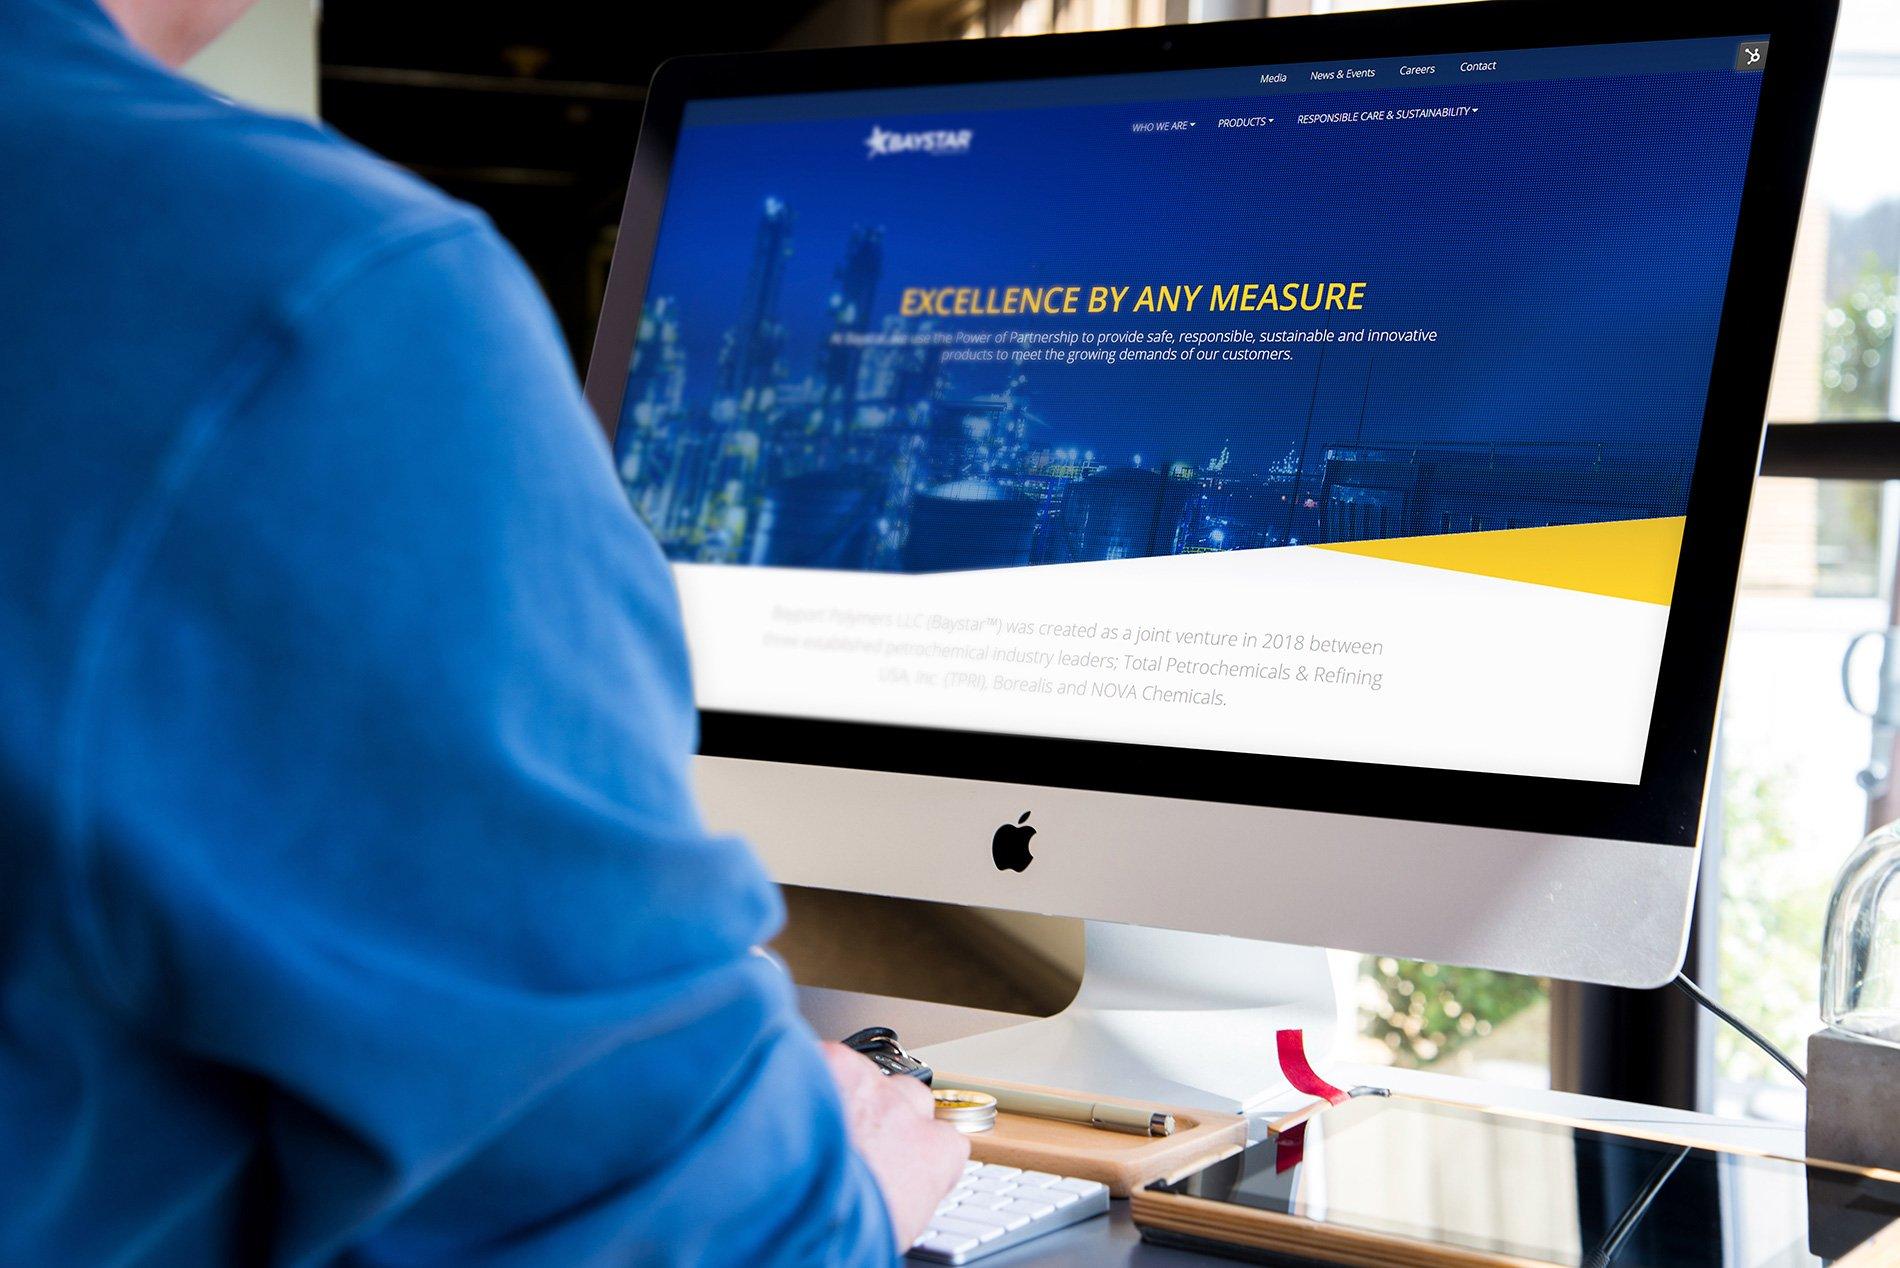 On-Target! Makreting | Digital Marketers In Houston | BayStar-02-2